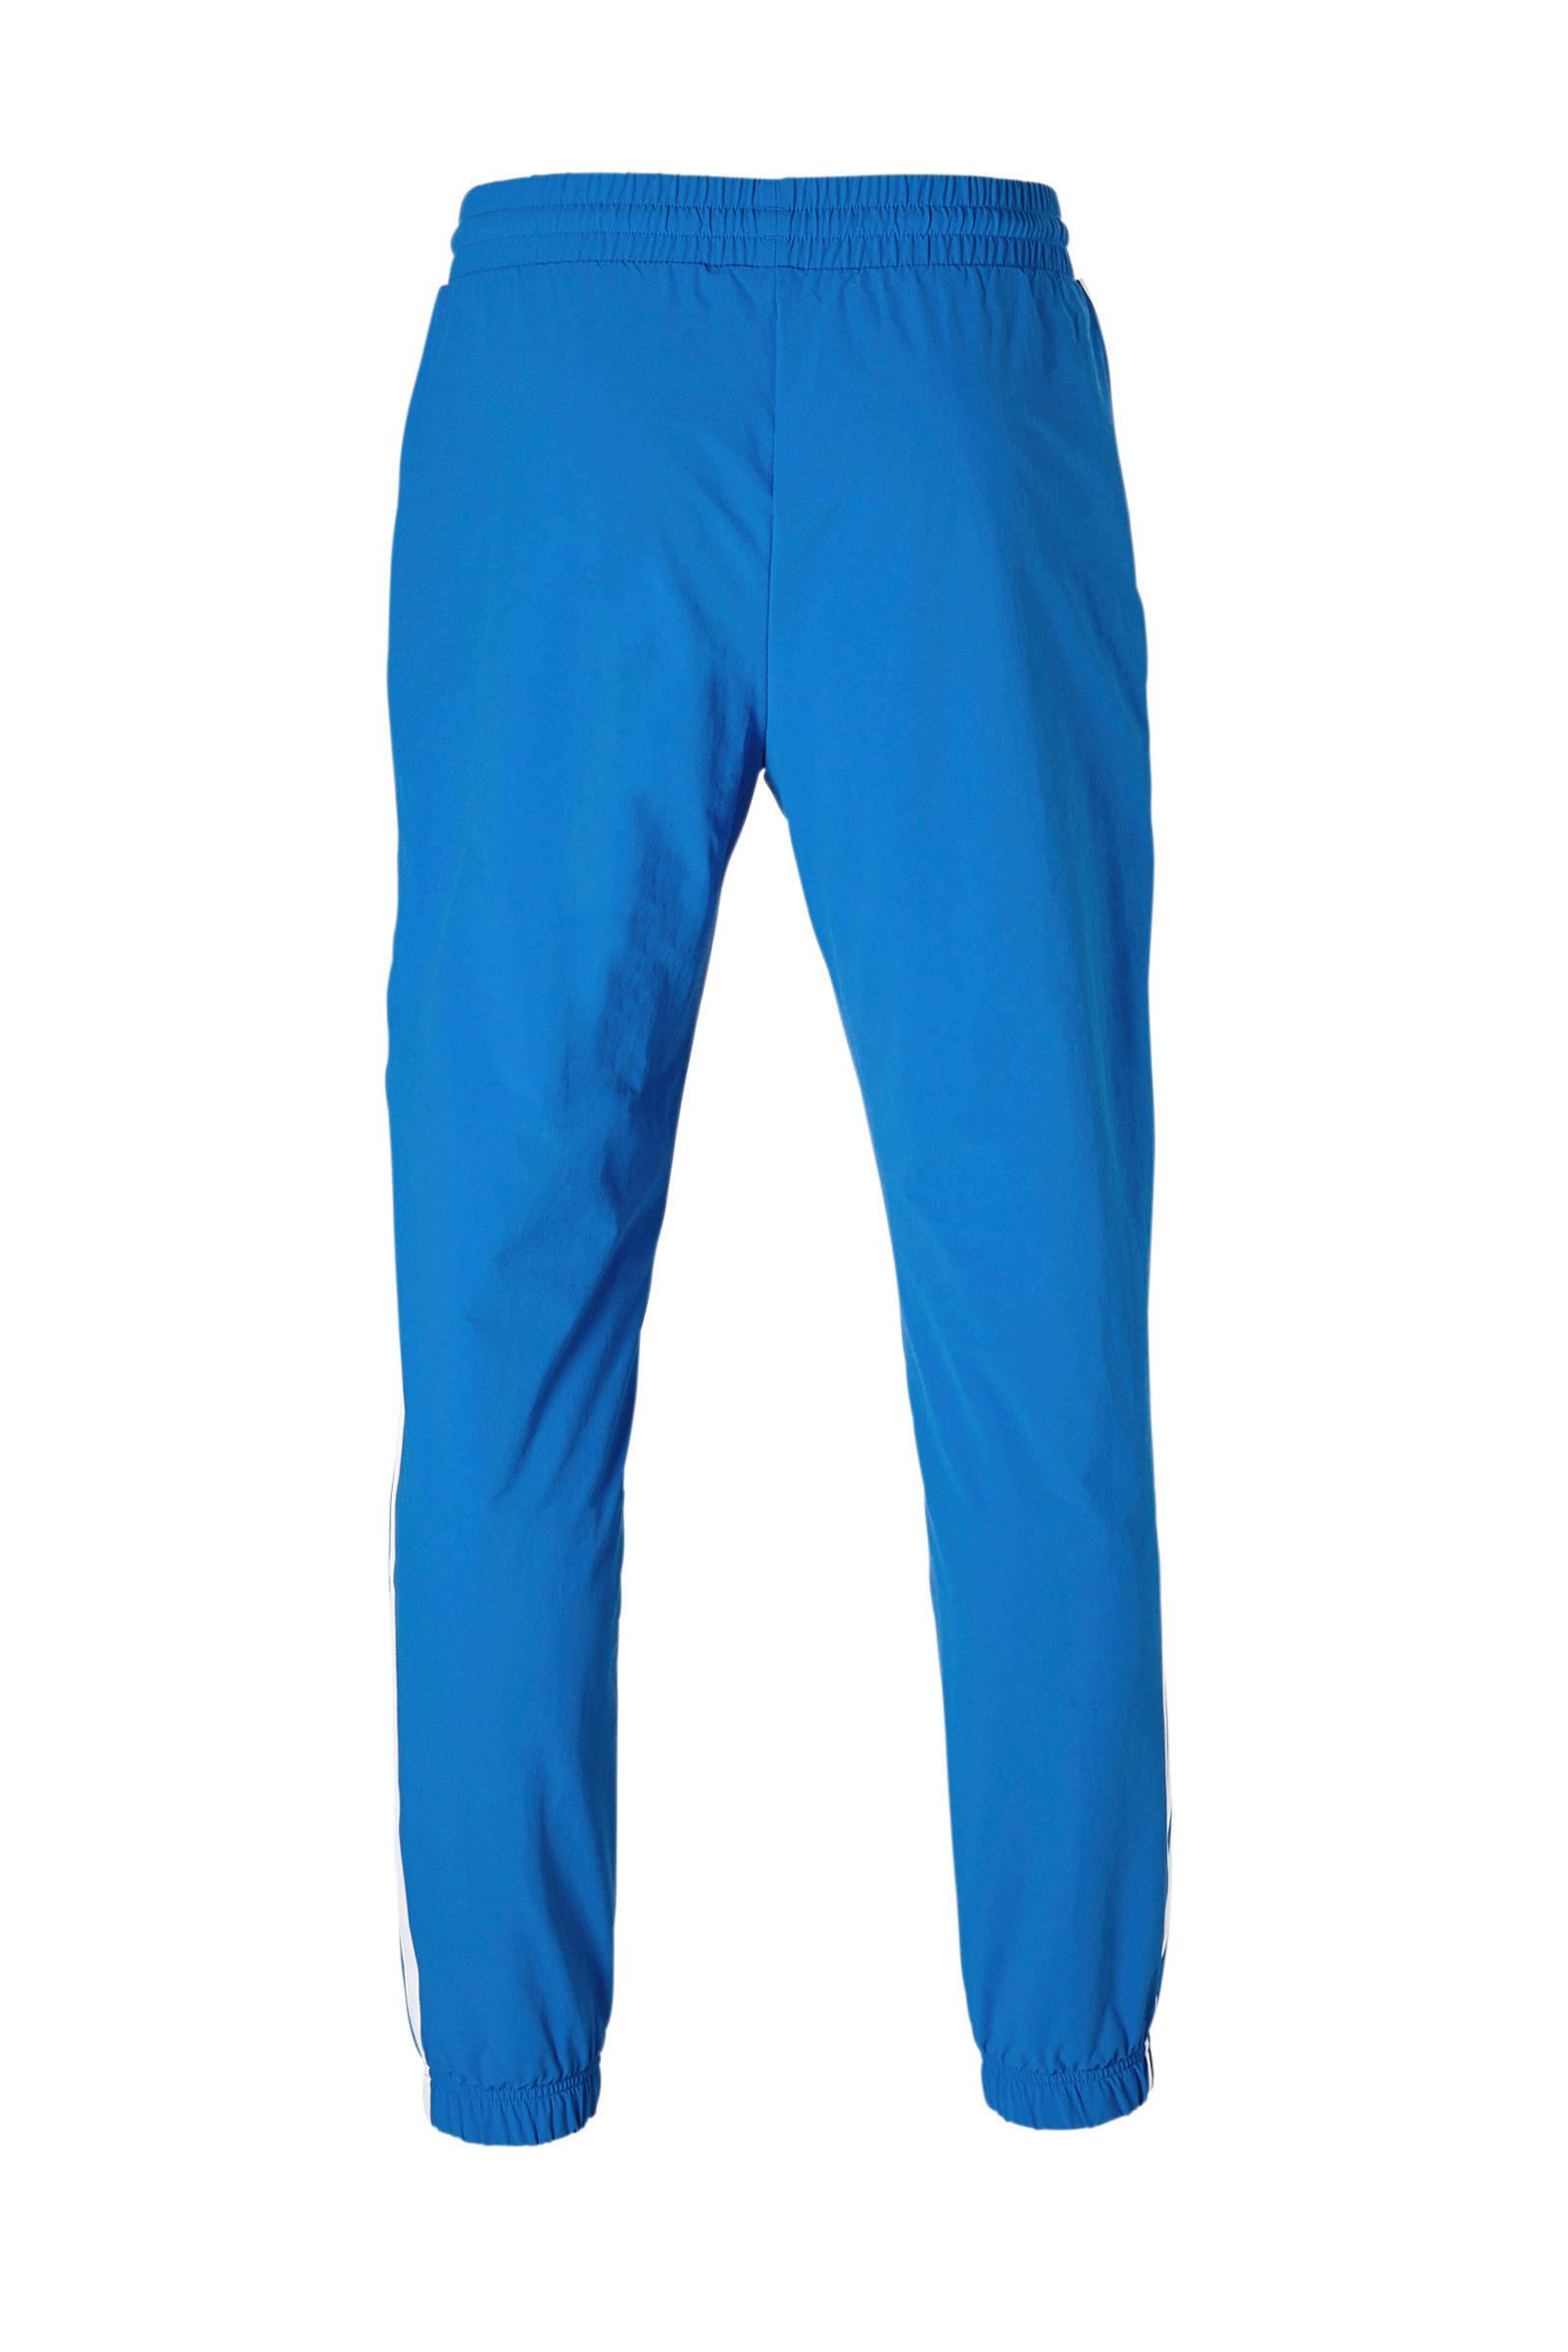 trainingsbroek blauw